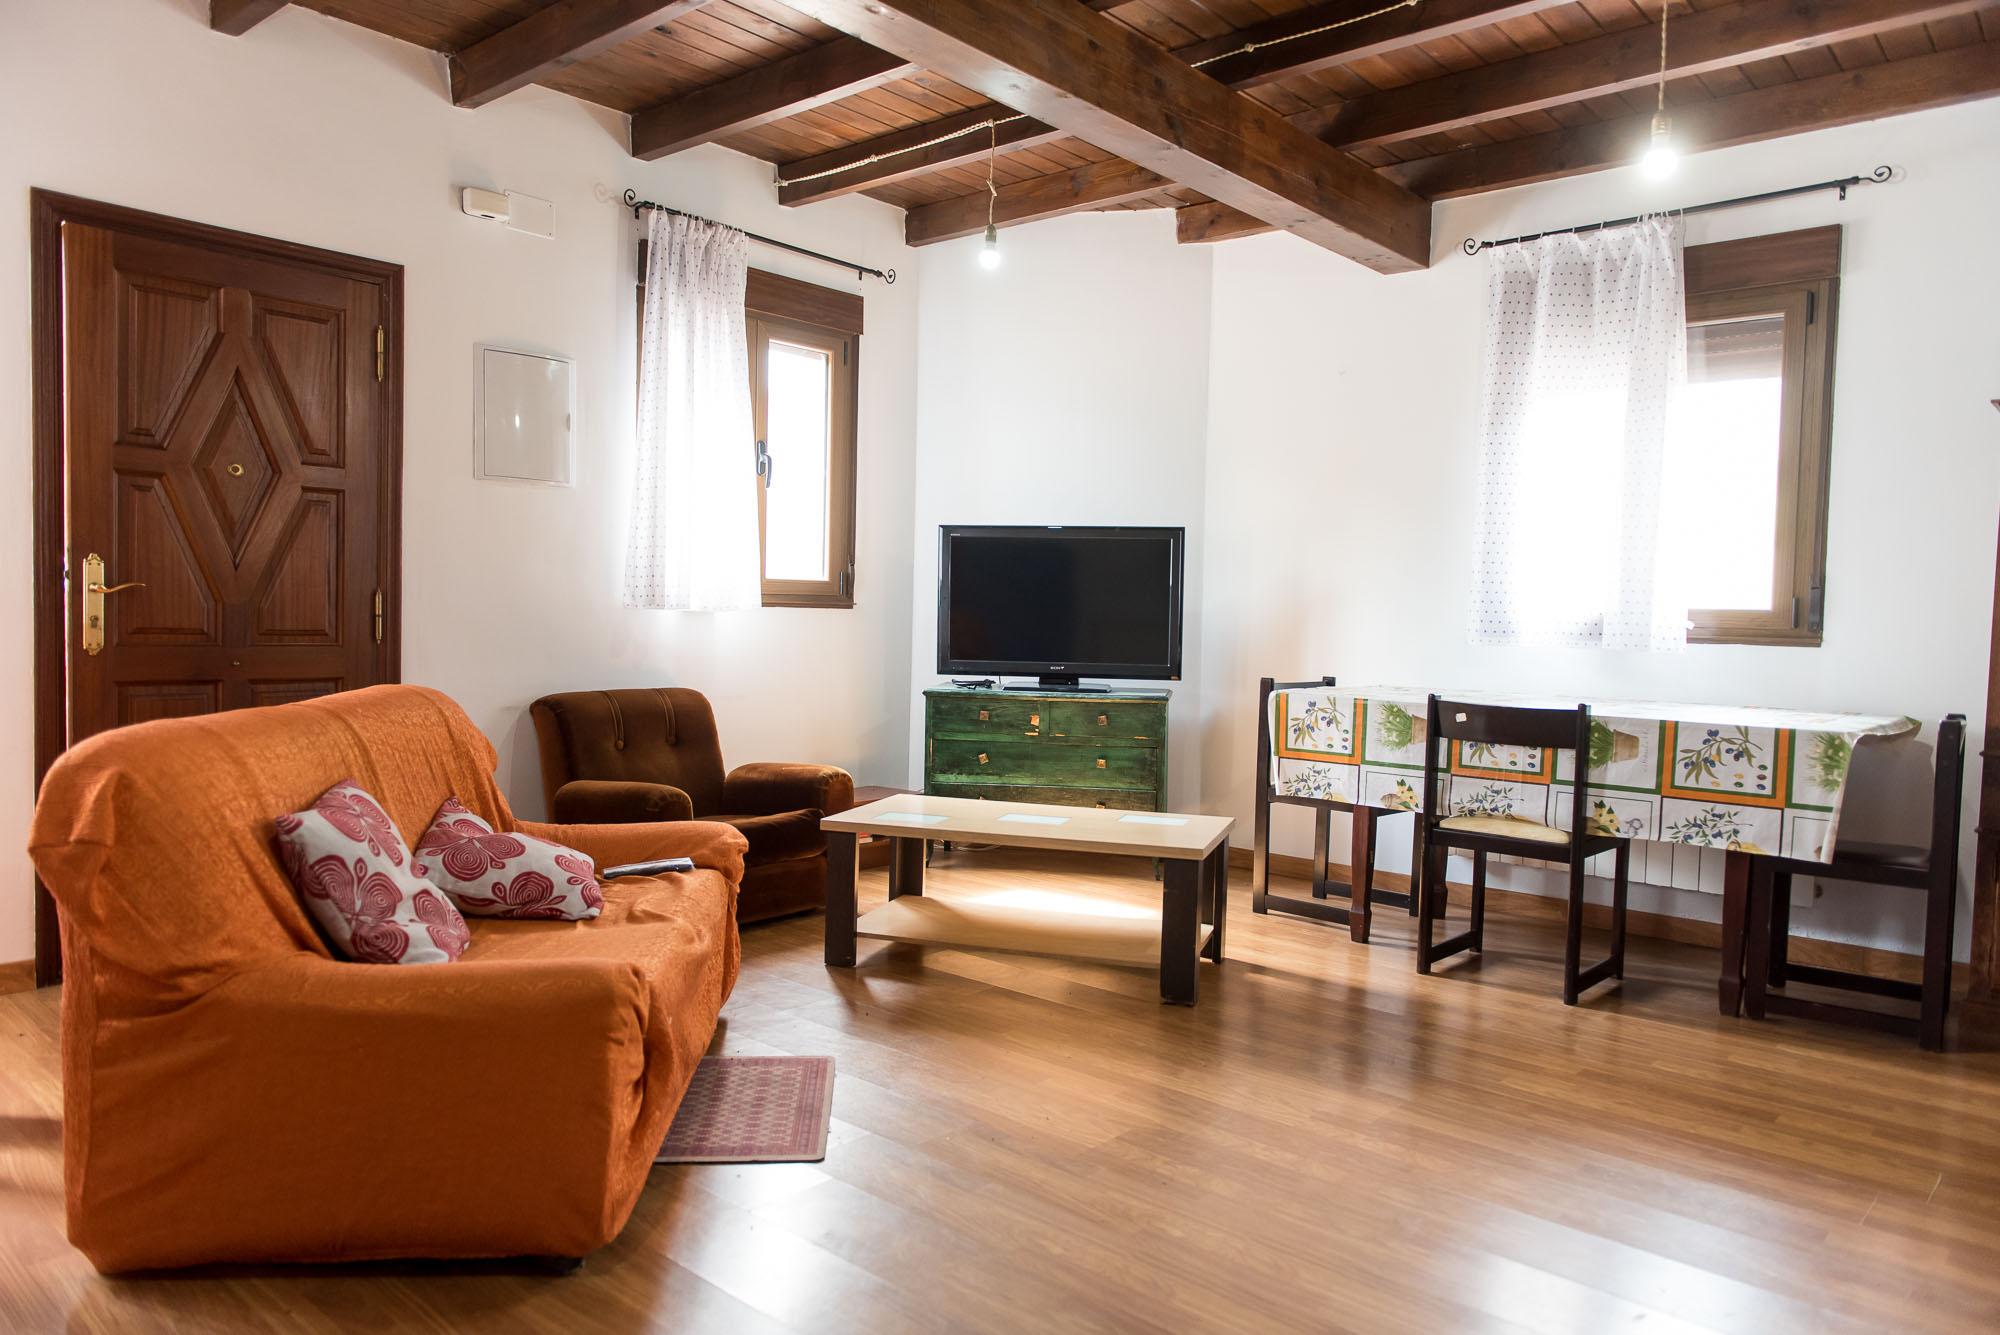 Casa en Vega de Espinareda